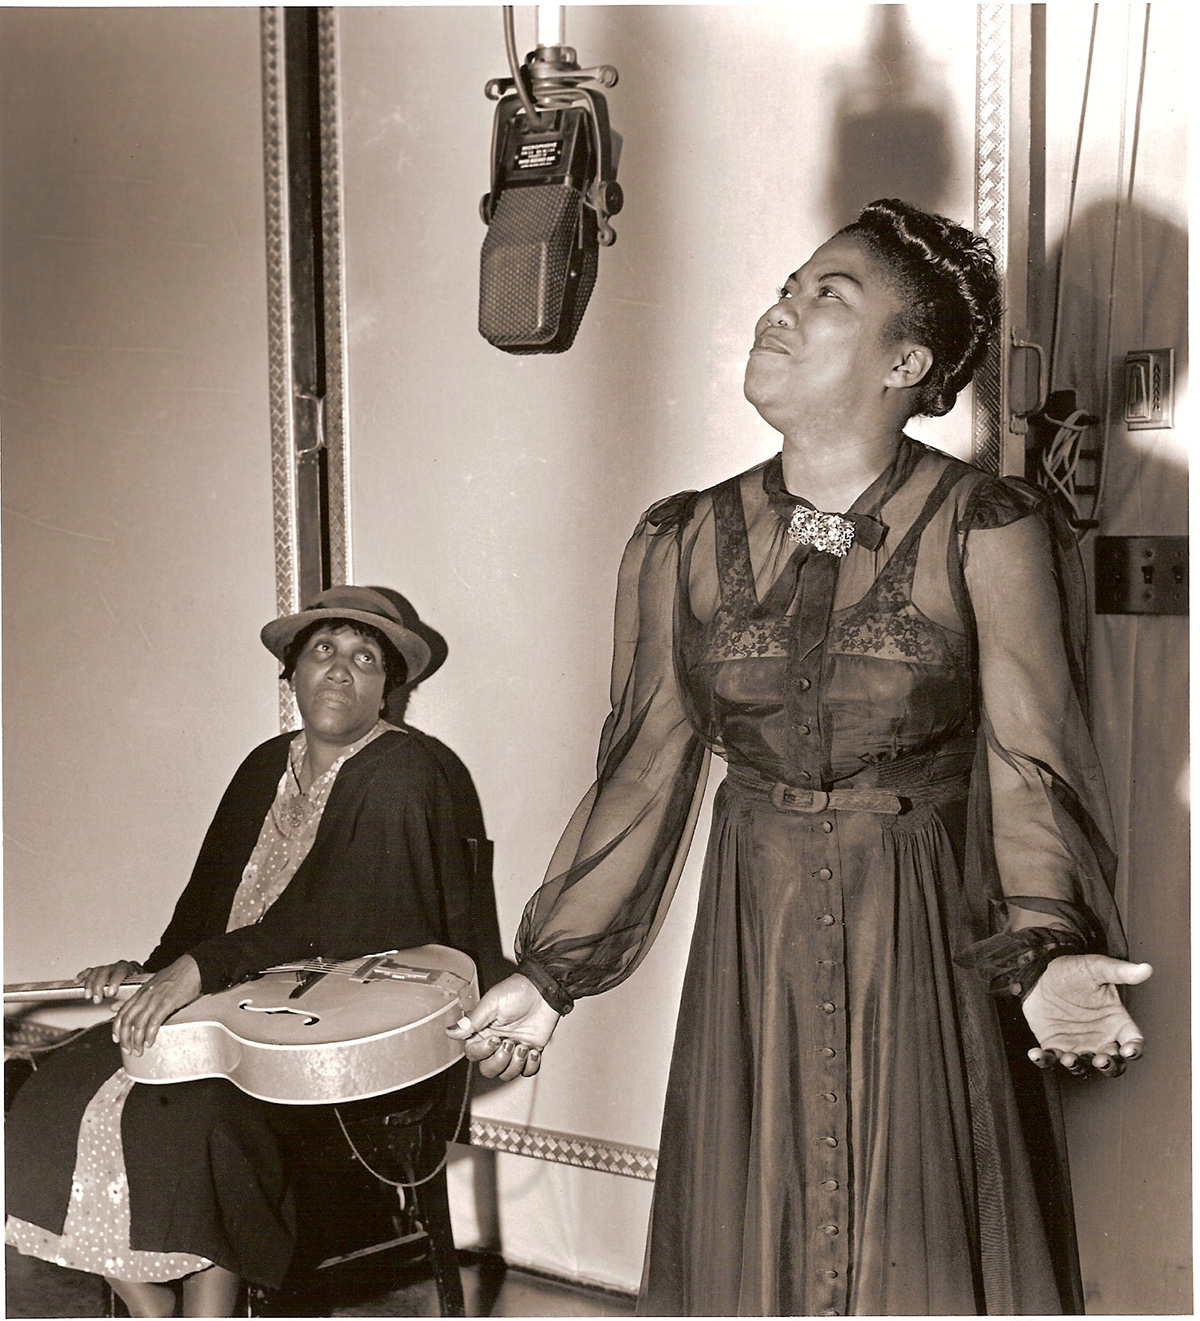 Sister Rosetta canta y su madre, Katie Bell, sostiene la guitarra. Foto: Charles Peterson